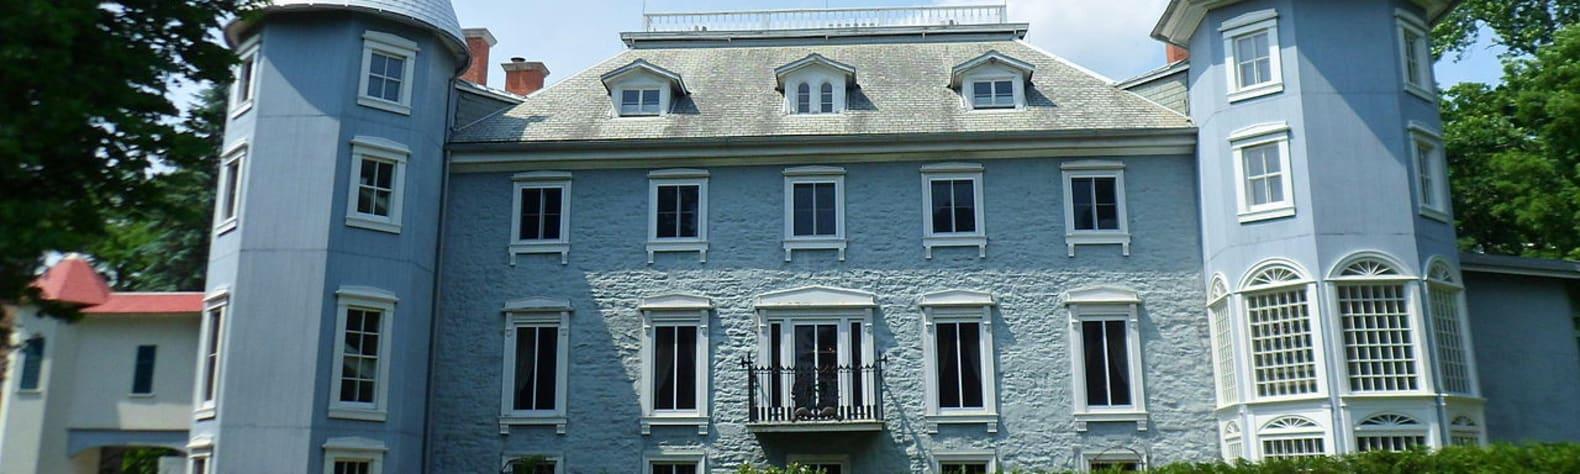 Manoir Papineau National Historic Site